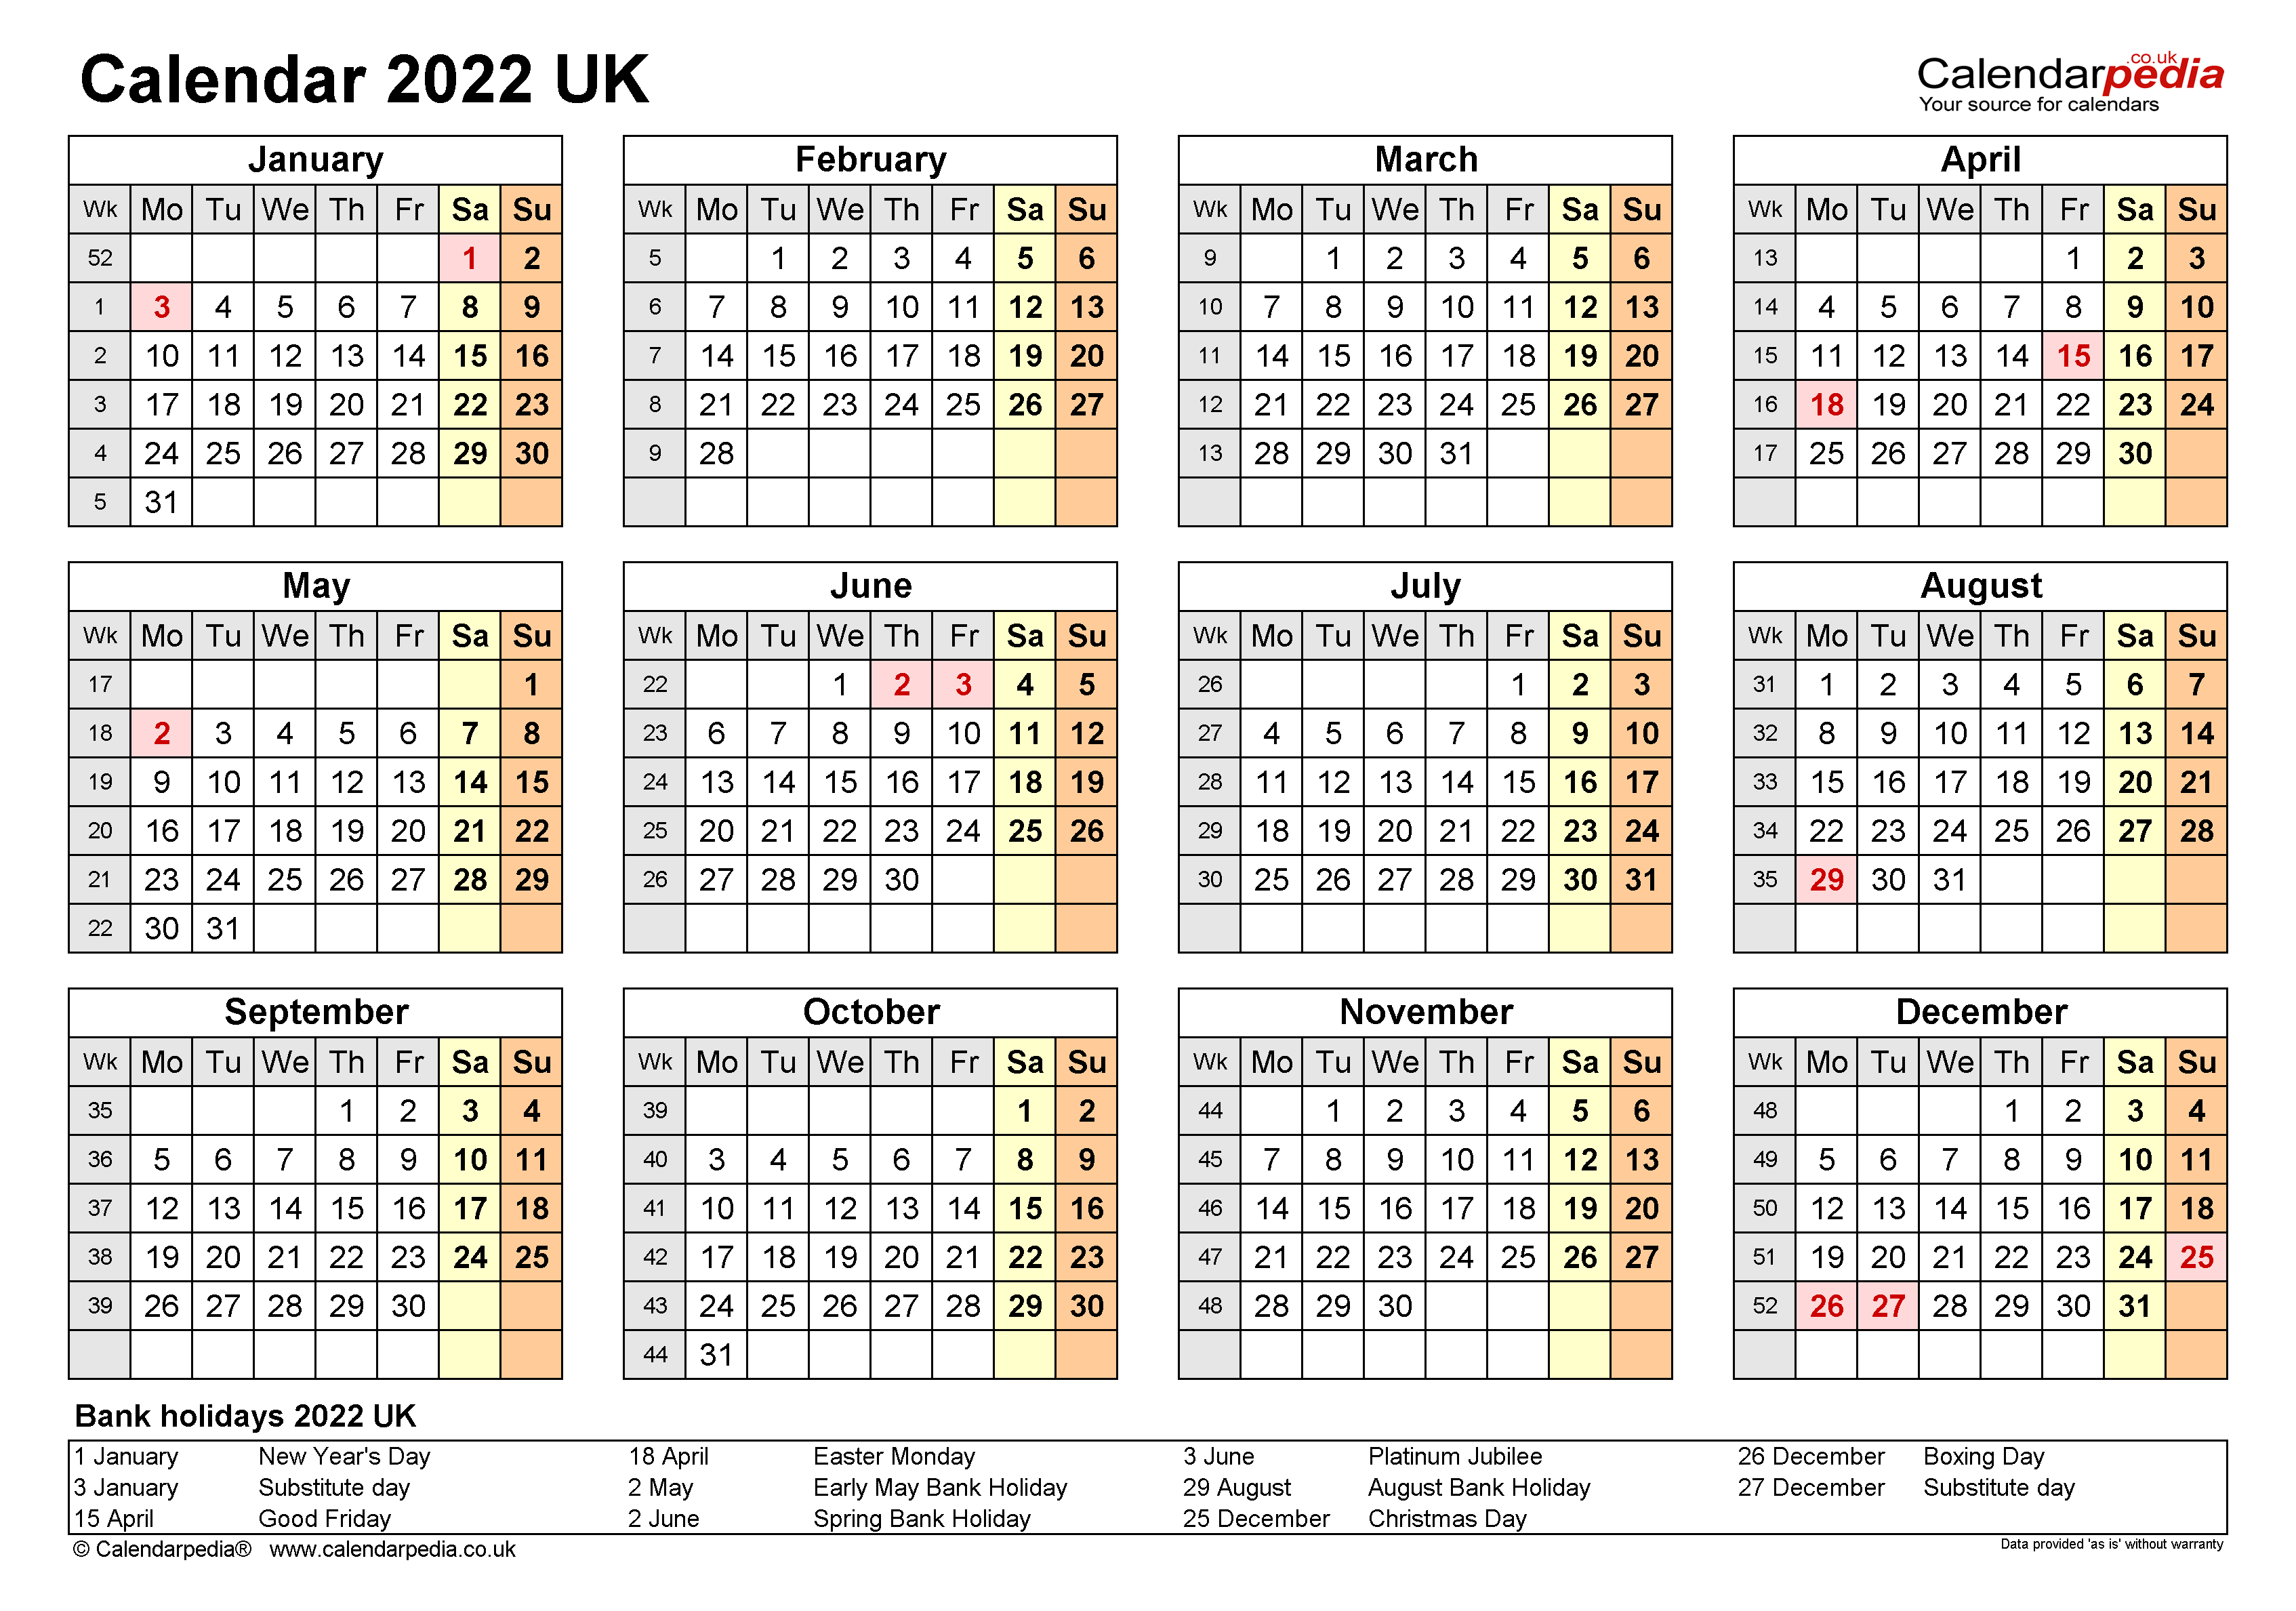 Calendar 2022 (UK) - free printable Microsoft Word templates